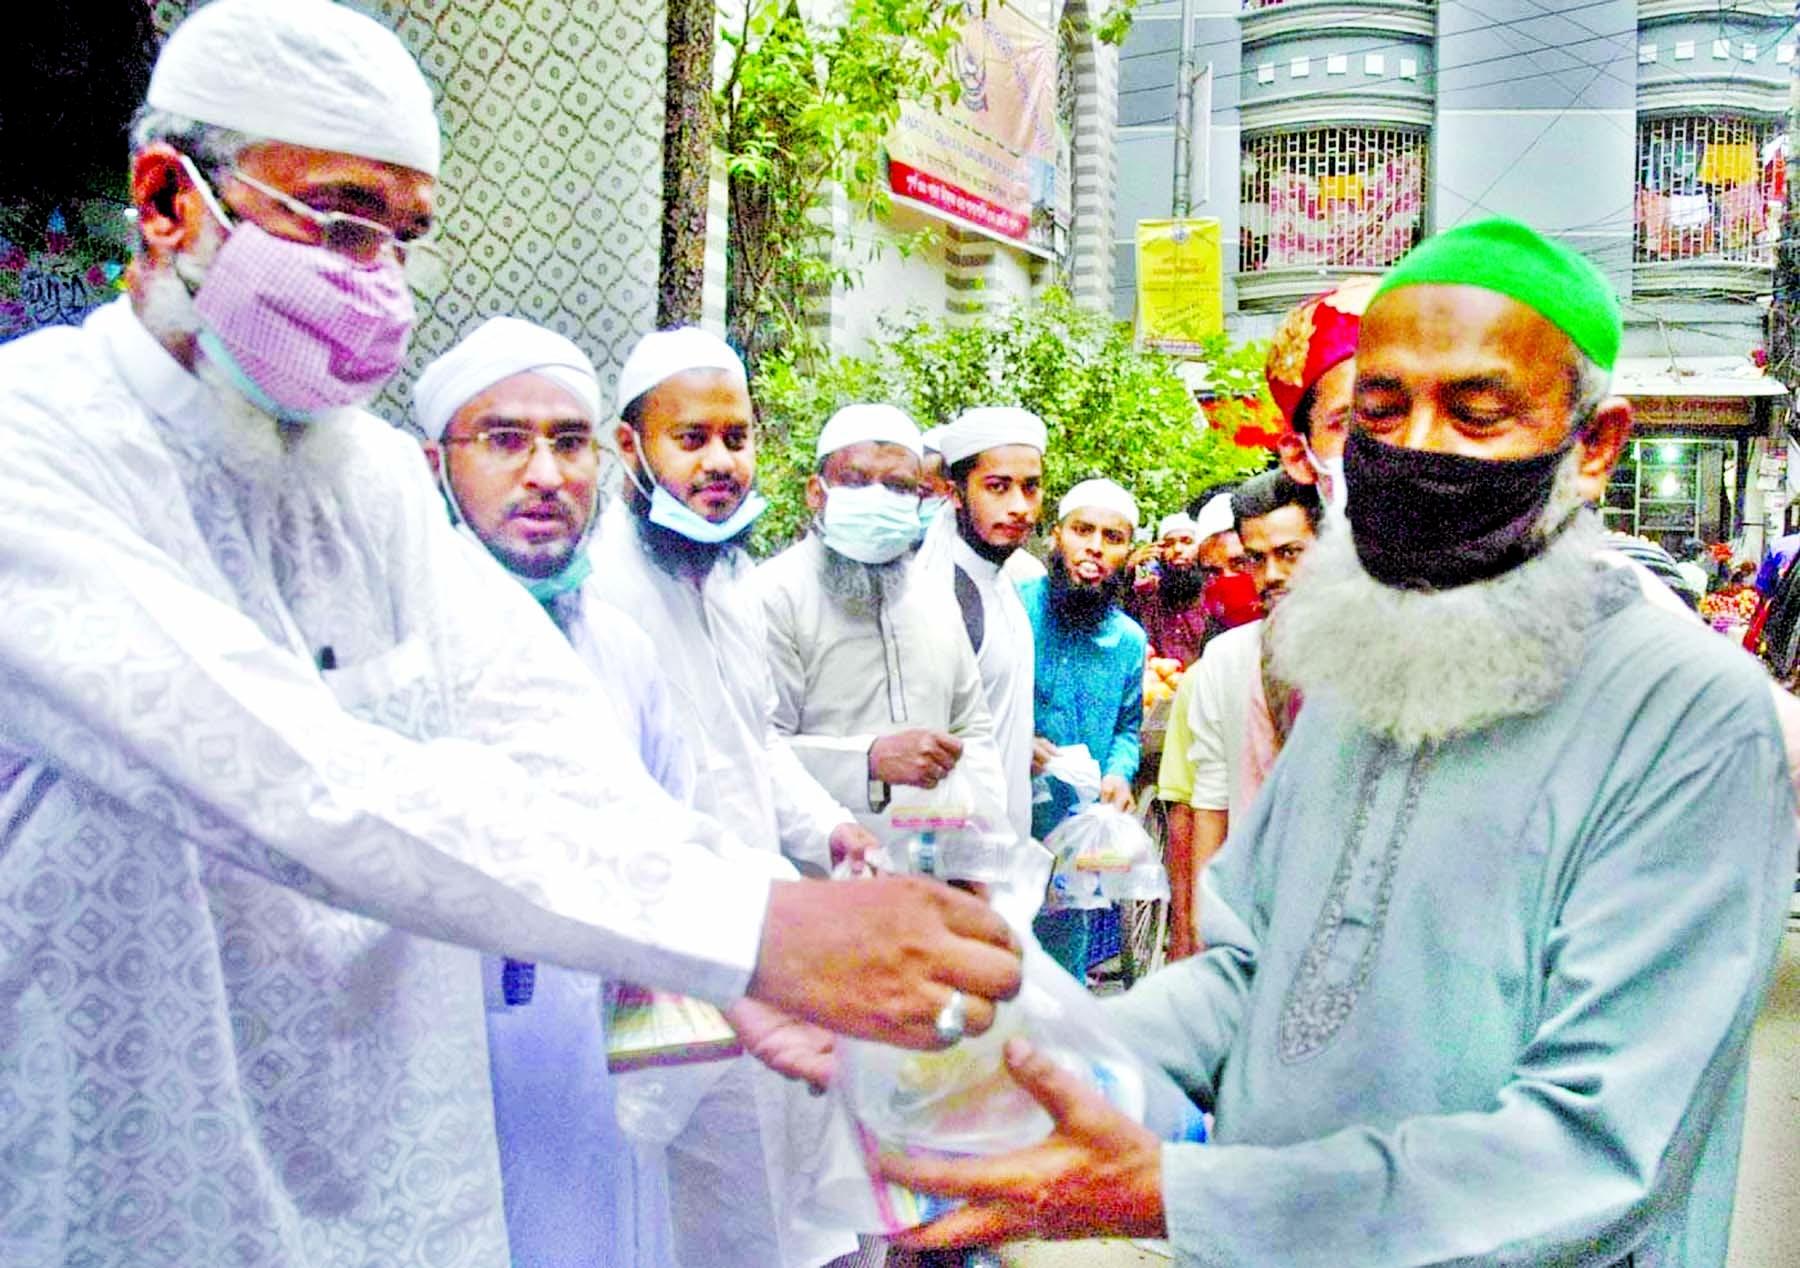 President and Senior Vice-President of Islami Sramik Andolon, Dhaka City South Alhaj Zahangir Alam and Siddiqur Rahman respectively distribute iftar among the destitute at Agamosi Lane area in the city on Tuesday.